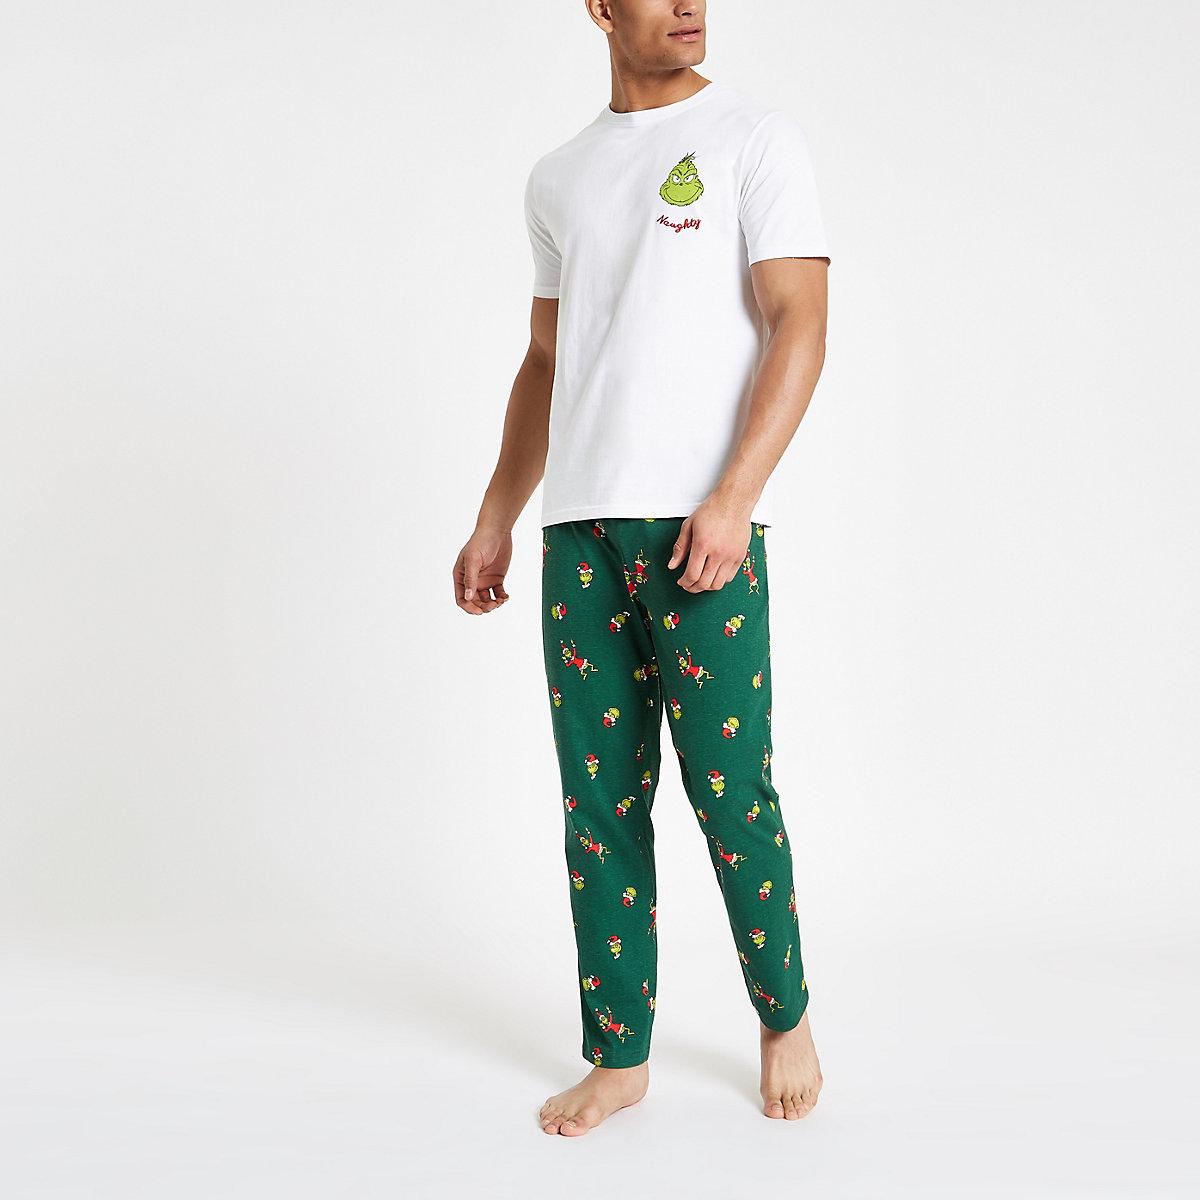 The Grinch green pajama set